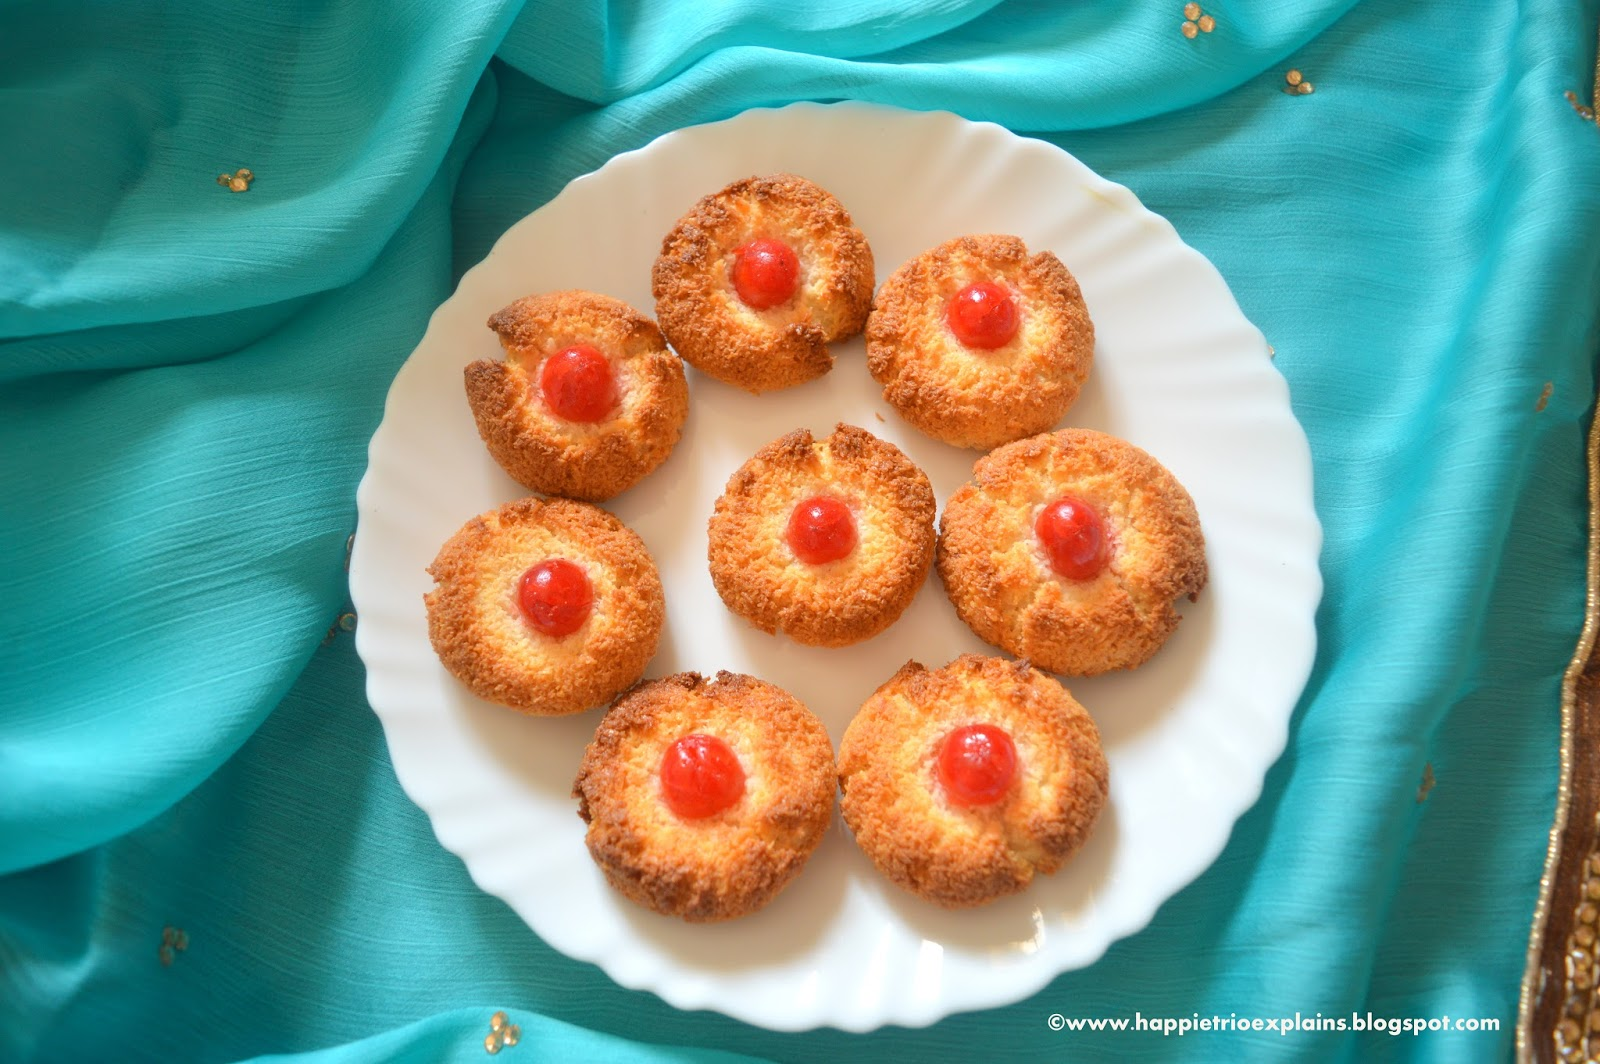 Cakes/Bakes